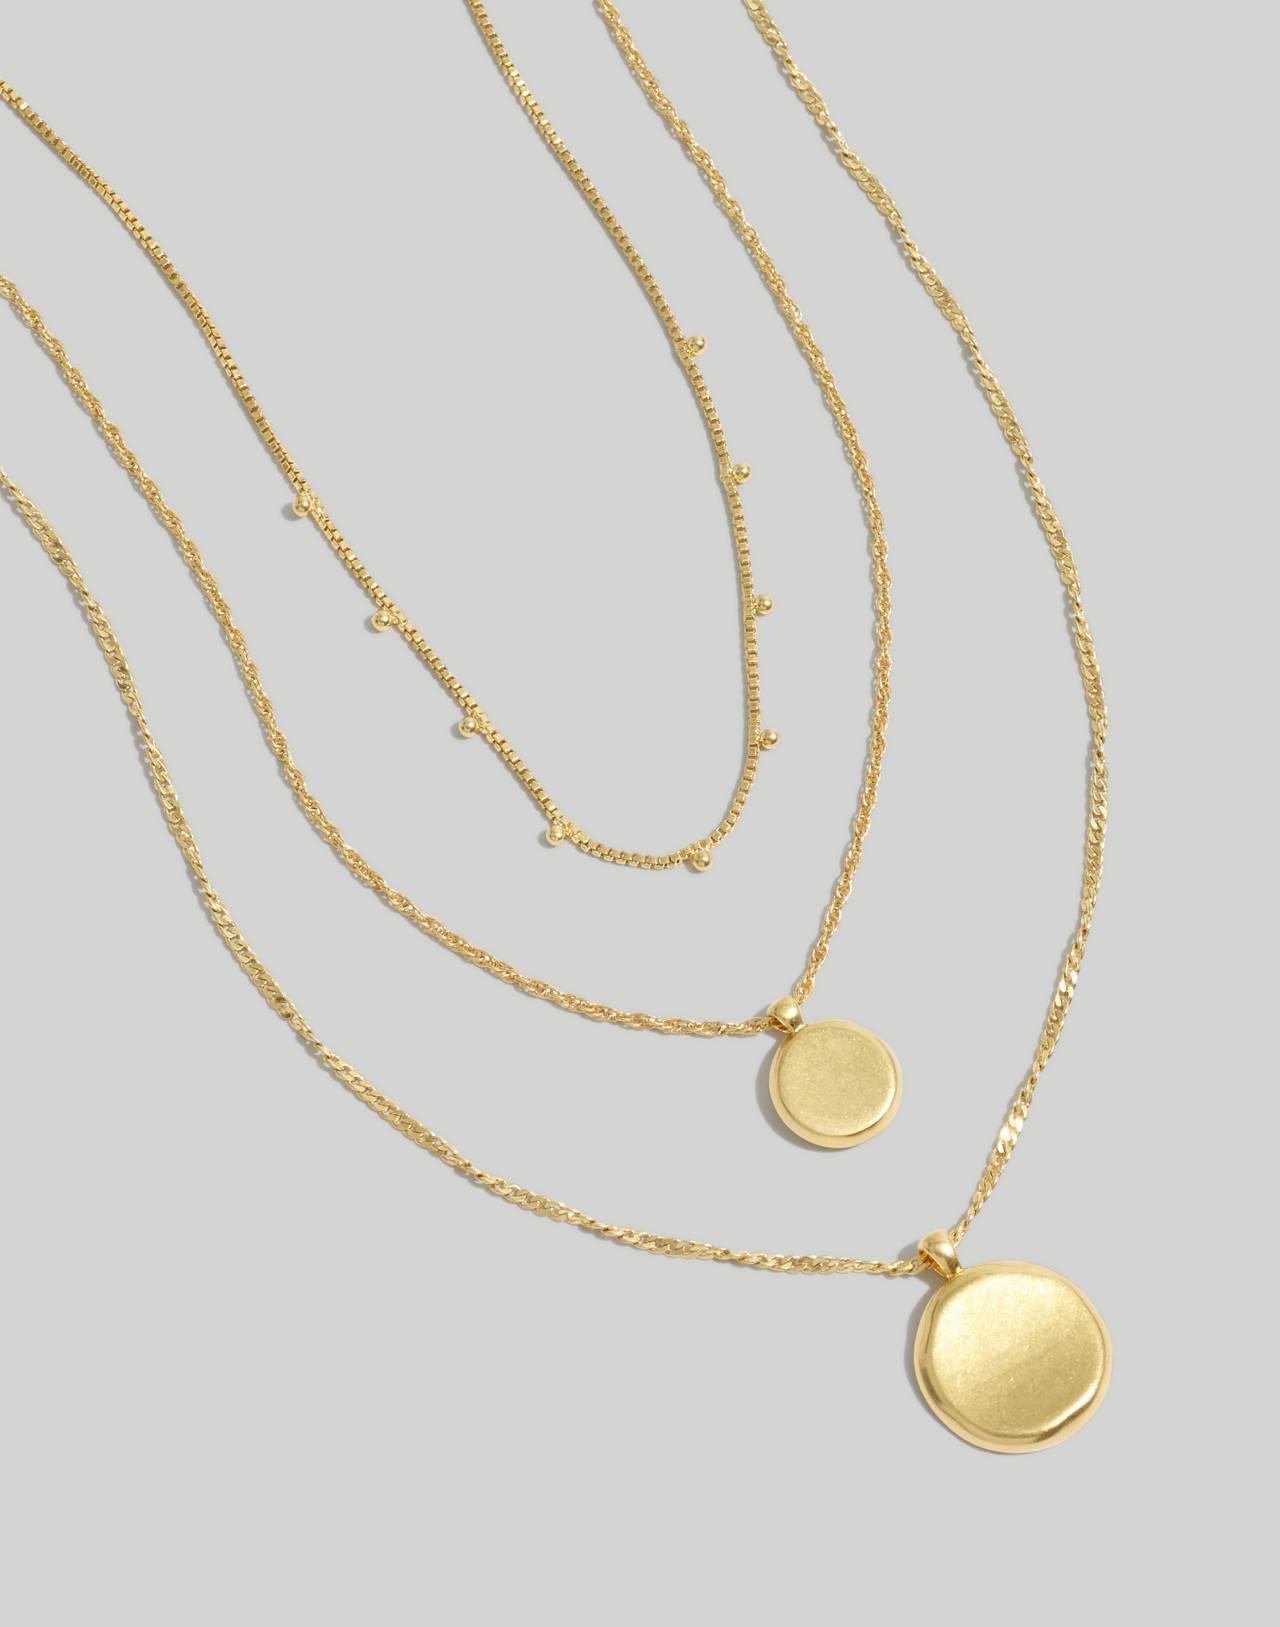 Coin Necklace Set in vintage gold image 1